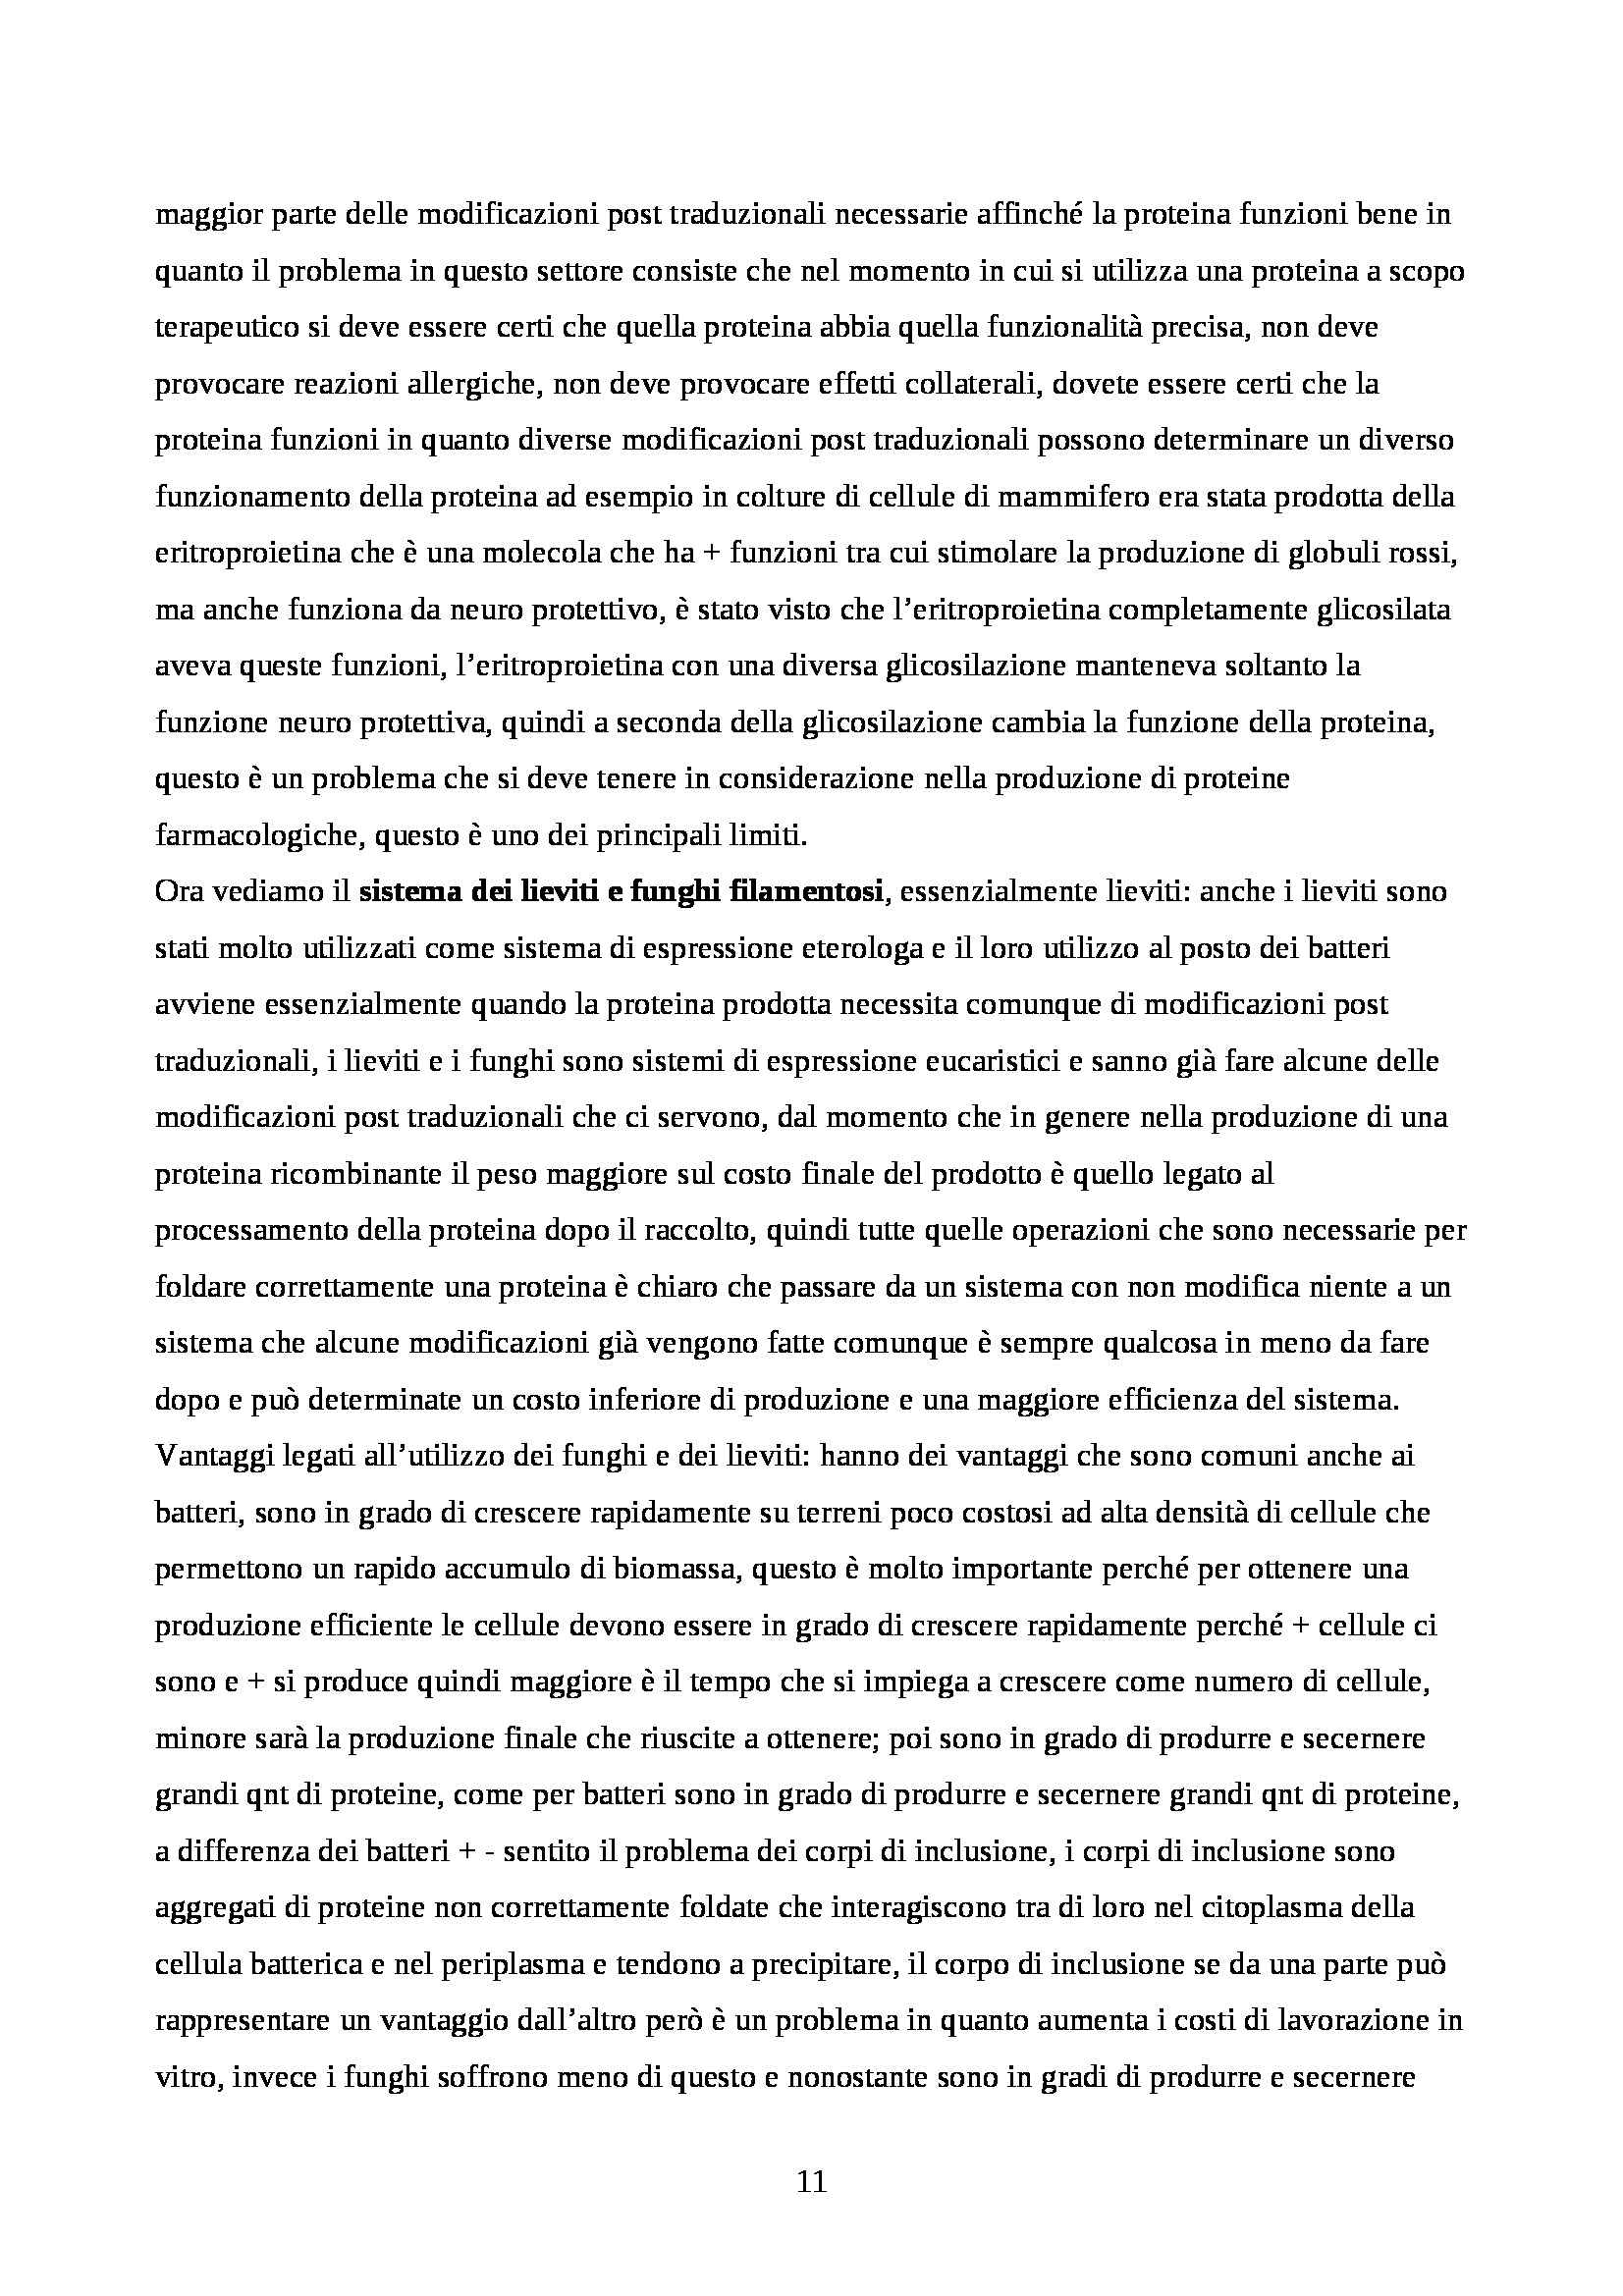 Biotecnologie agro-mediche - Appunti Pag. 11